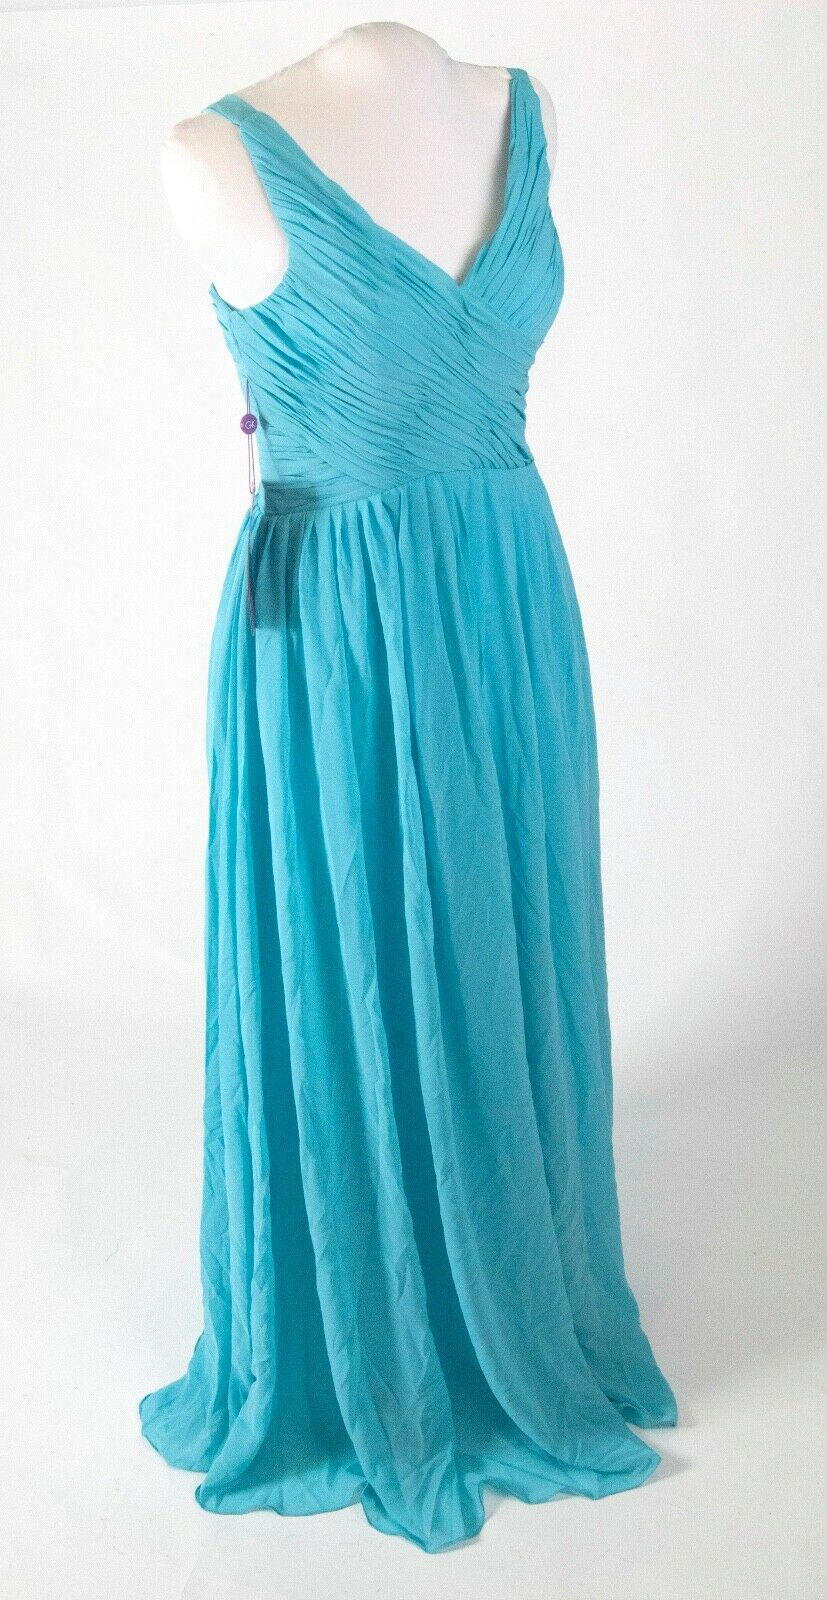 (5) NWT Grace Karin Light Blue Formal Gowns Bridesmaid Dresses sz 2 4 6 Wedding